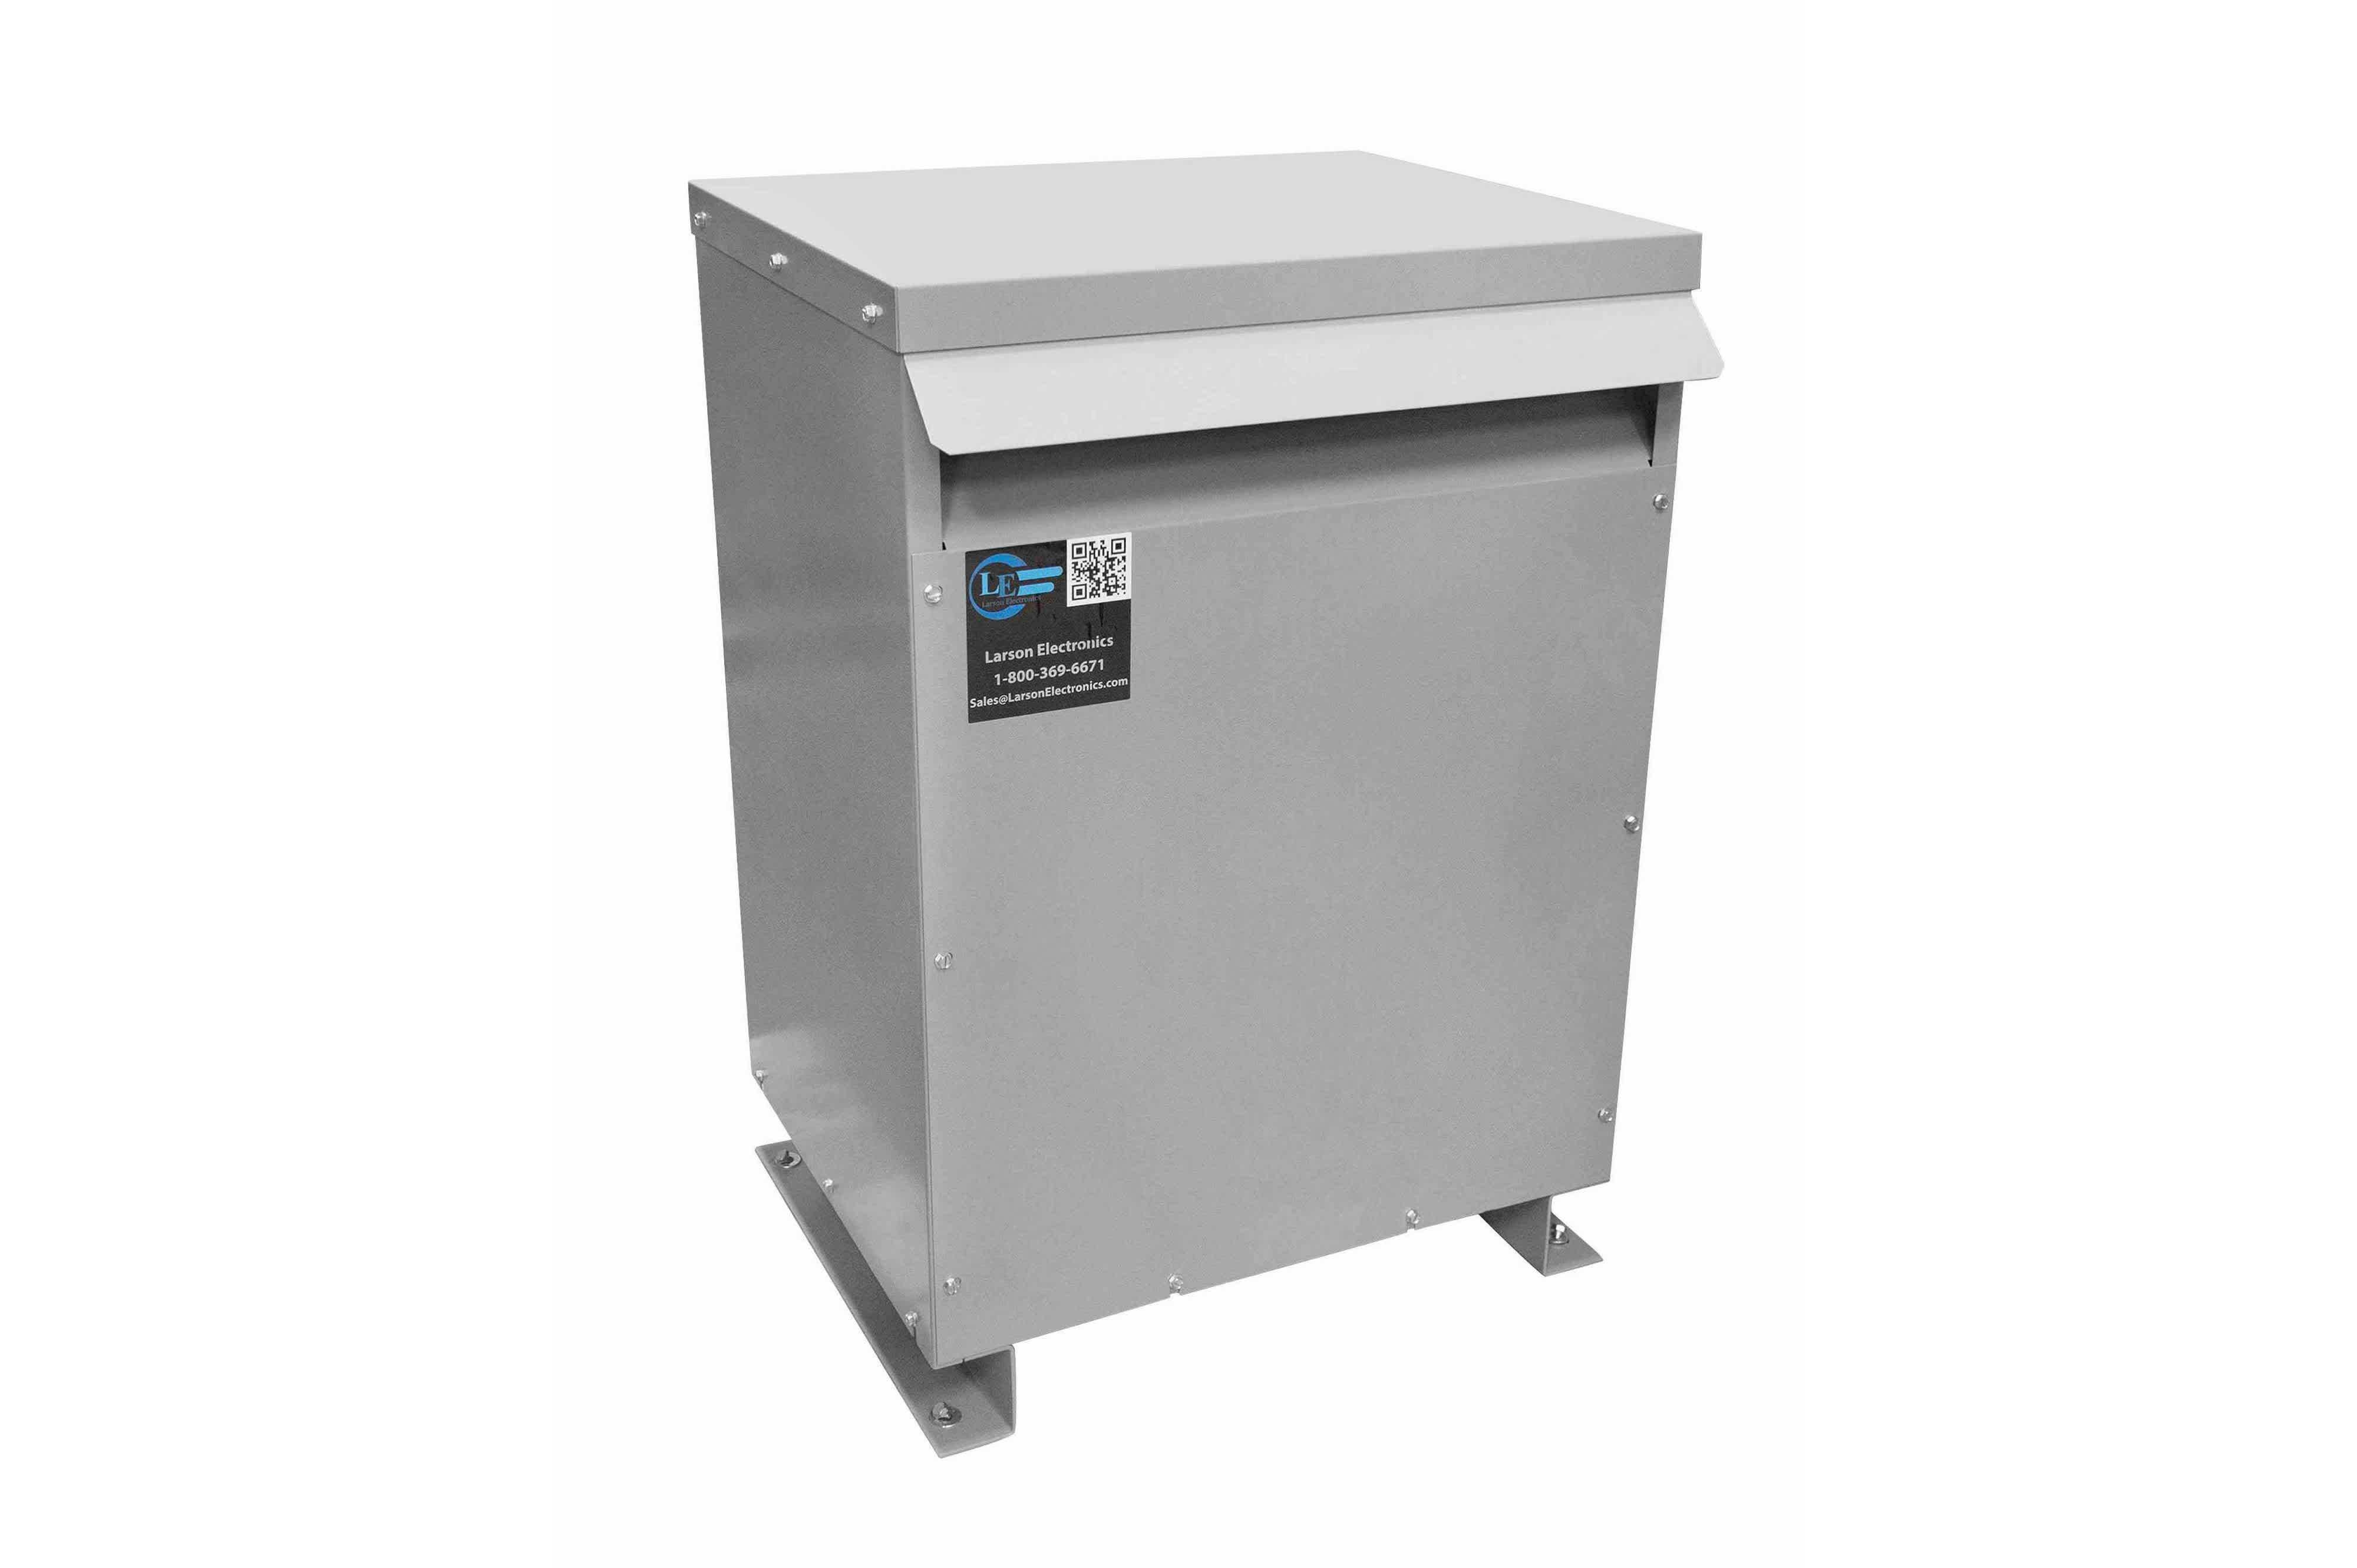 37.5 kVA 3PH Isolation Transformer, 240V Wye Primary, 208Y/120 Wye-N Secondary, N3R, Ventilated, 60 Hz